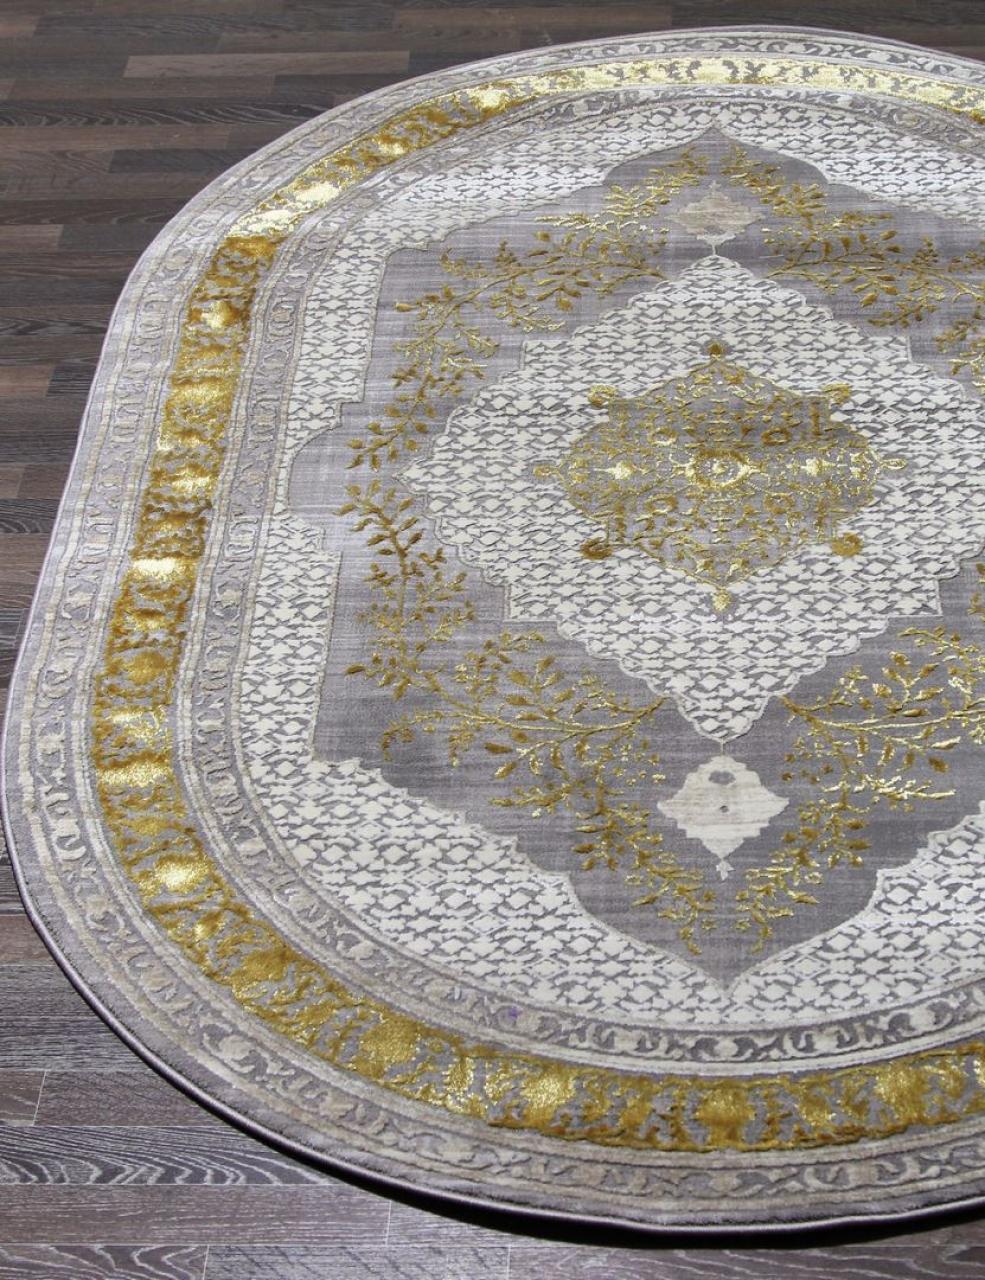 Ковер 17340 - 957 - Овал - коллекция Elite - фото 5